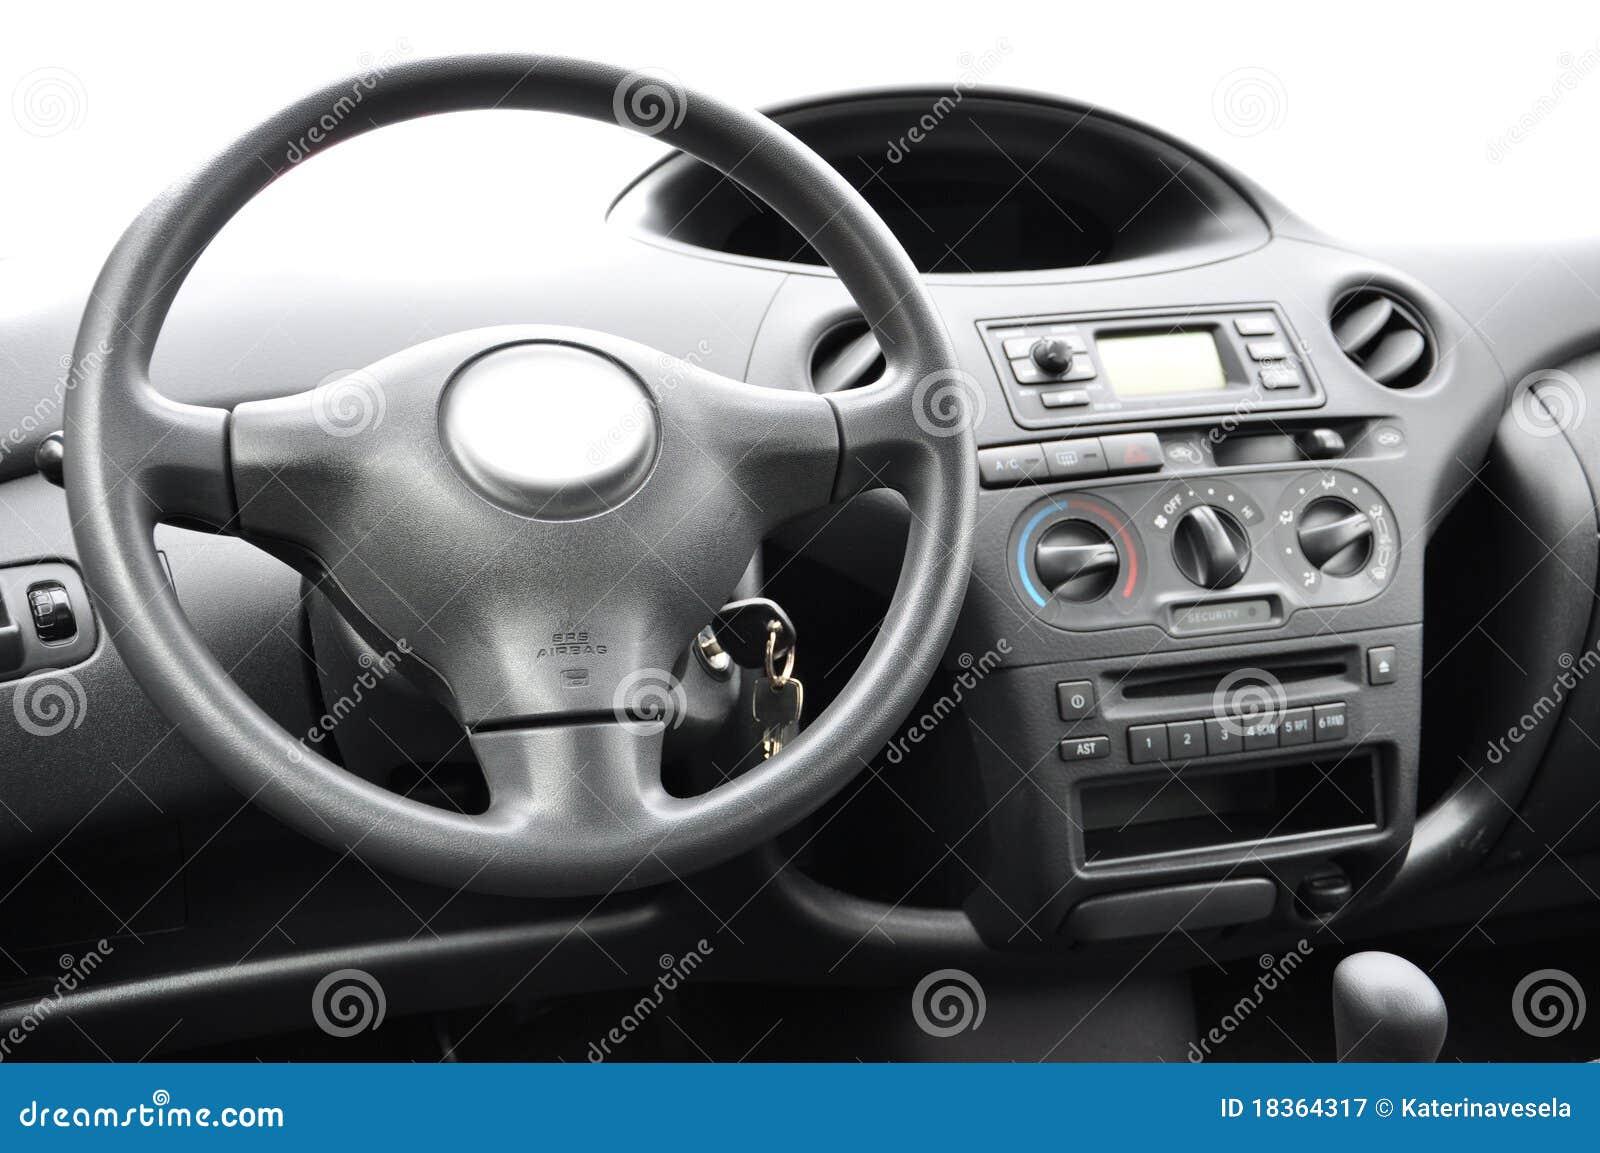 car interior stock image image of heat design heating 18364317. Black Bedroom Furniture Sets. Home Design Ideas